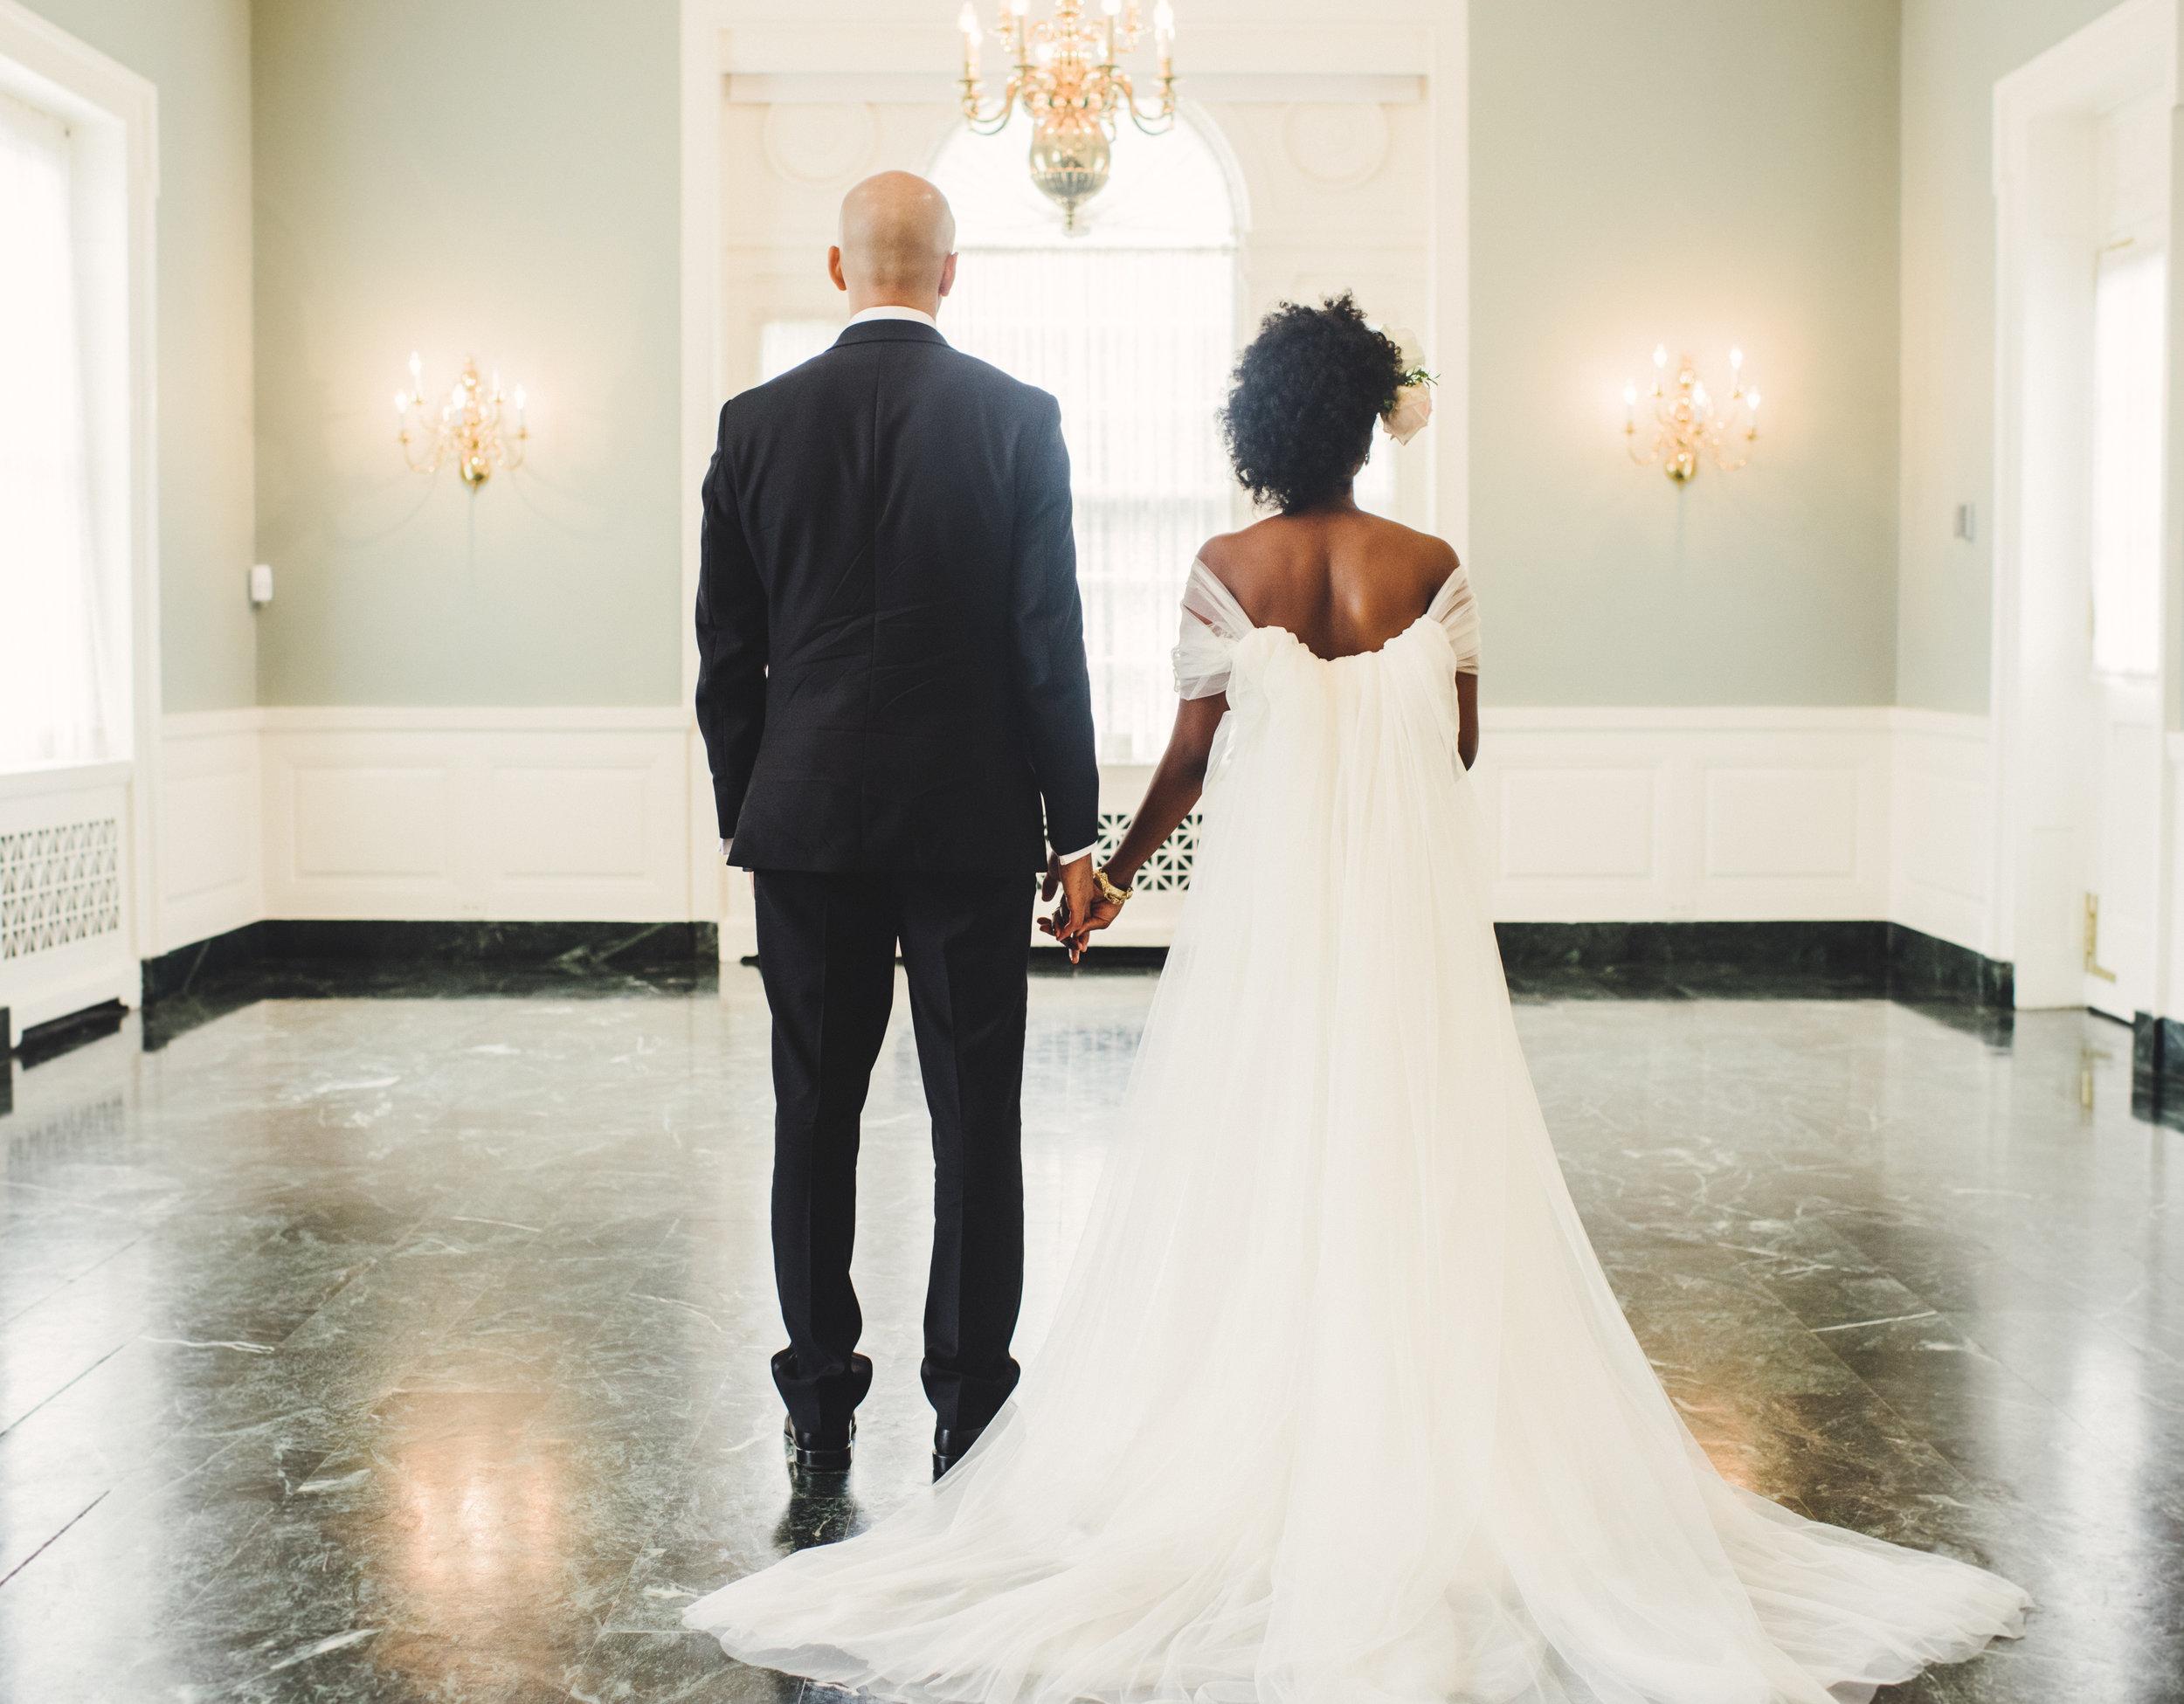 GLENVIEW MANSION WEDDING - INTIMATE WEDDING PHOTOGRAPHER - TWOTWENTY by CHI-CHI AGBIM-169.jpg